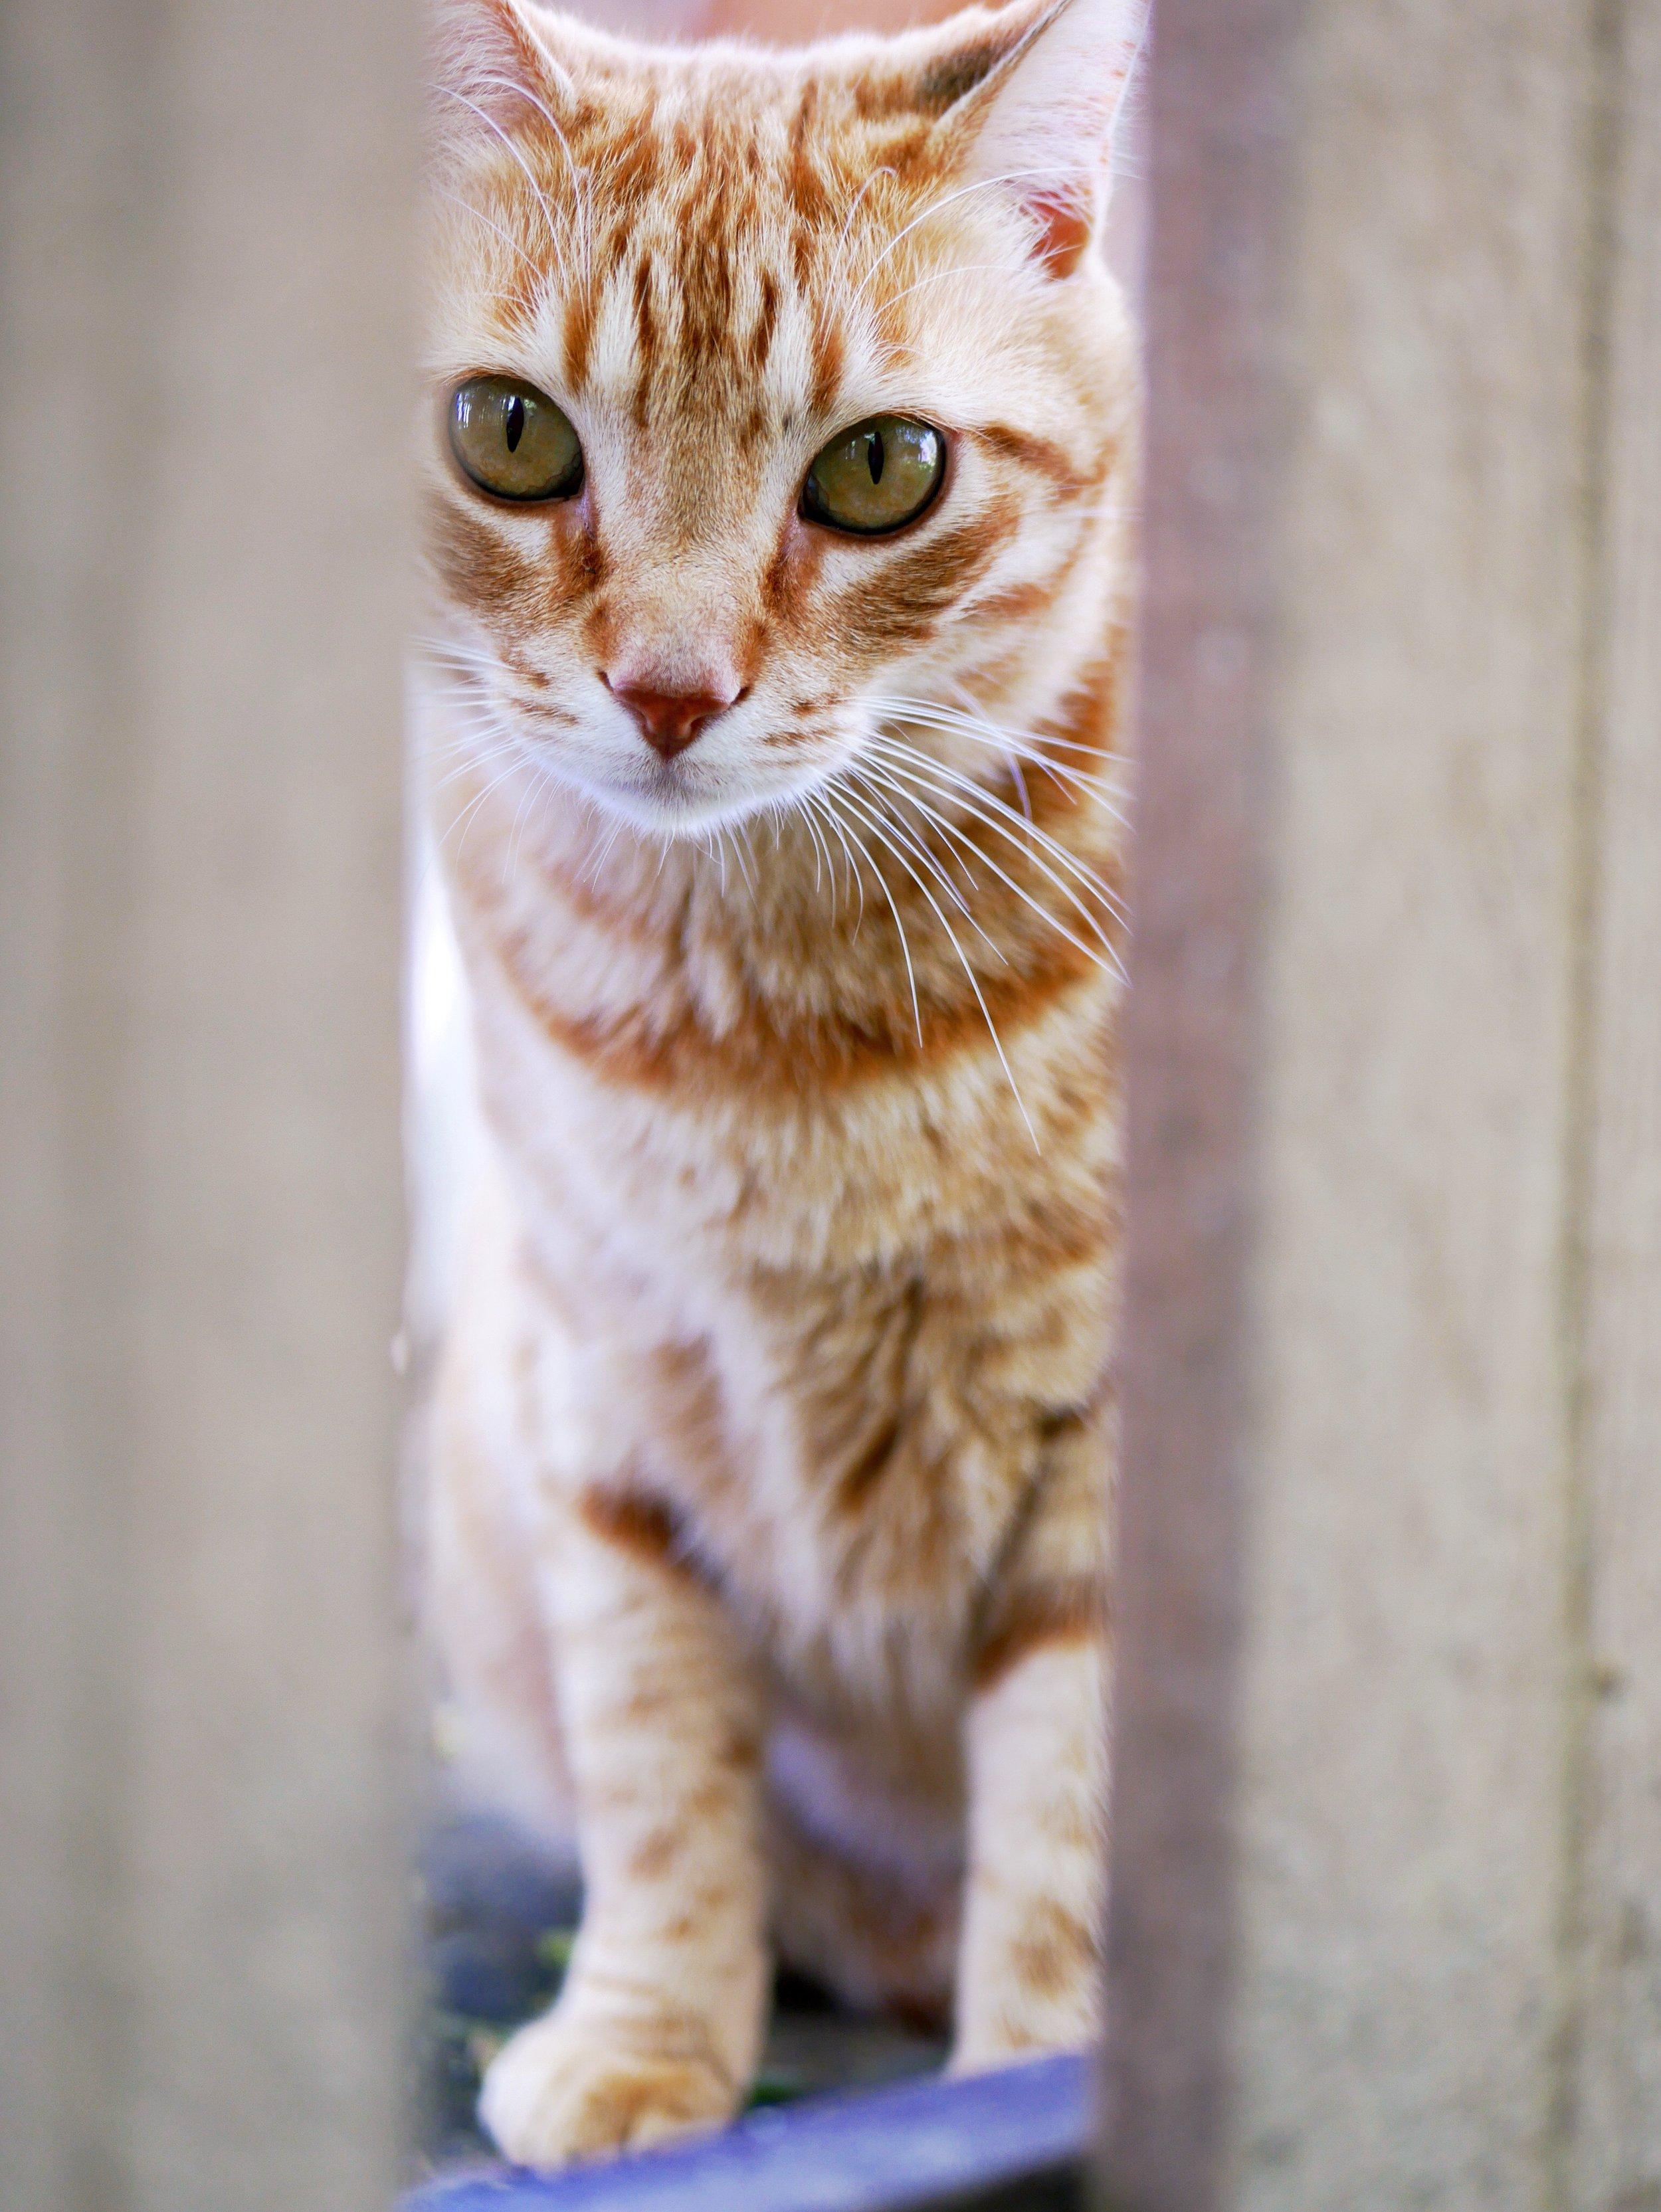 ginger cat curious